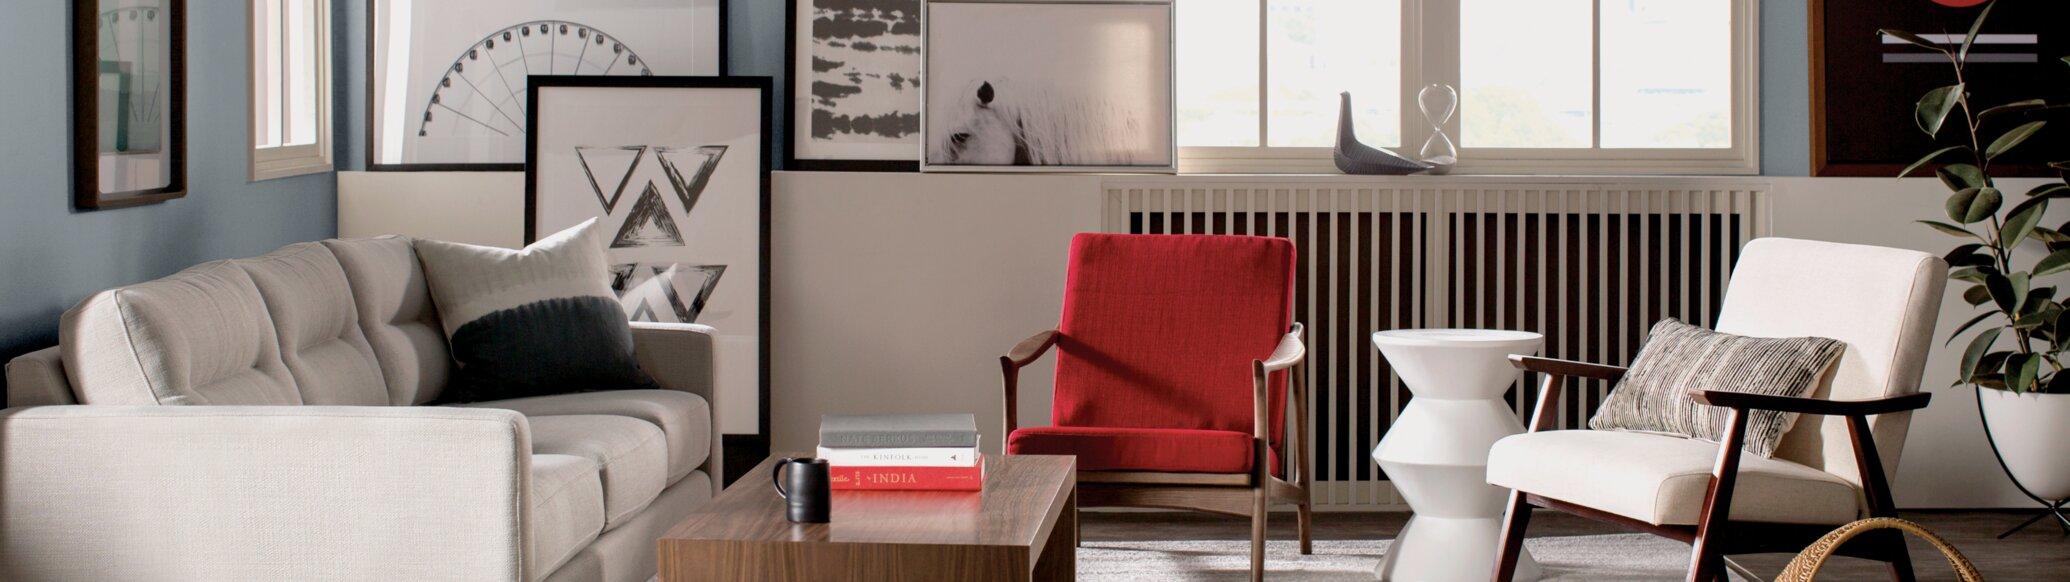 Wayfair Design Services